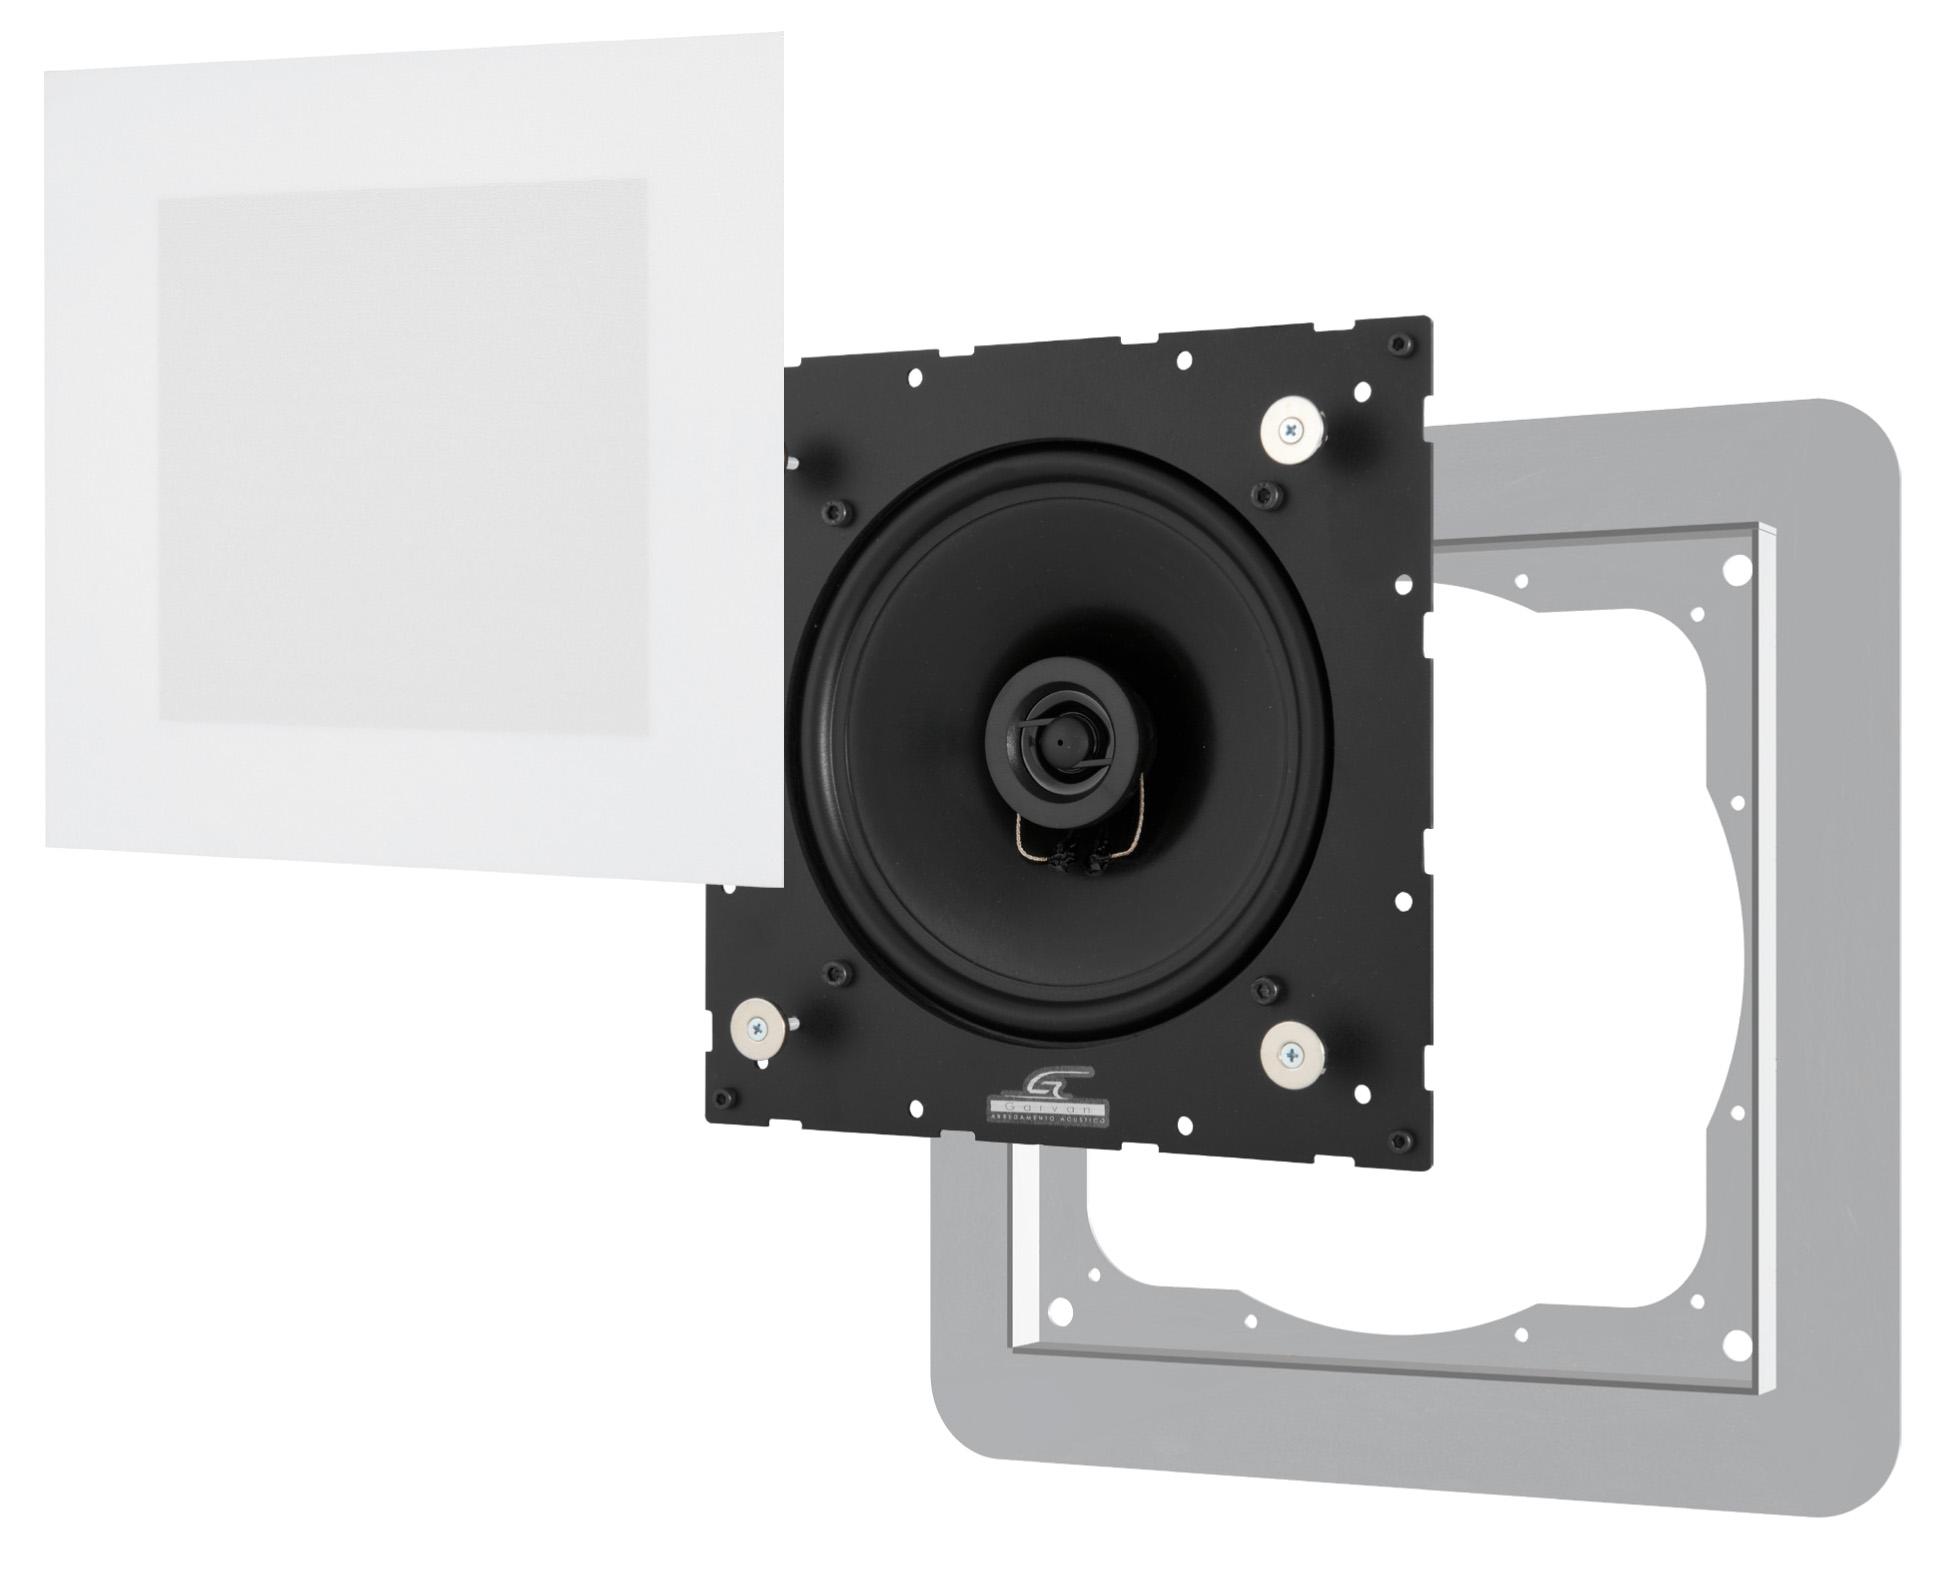 Sic117 garvan diffusori acustici filo muro